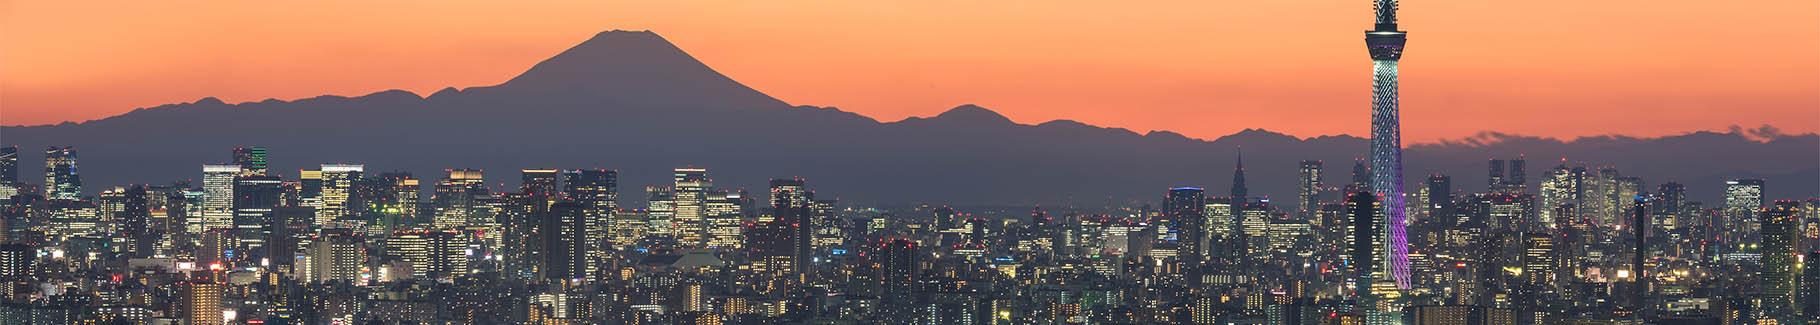 Fototapeta miasto nocą i Tokio